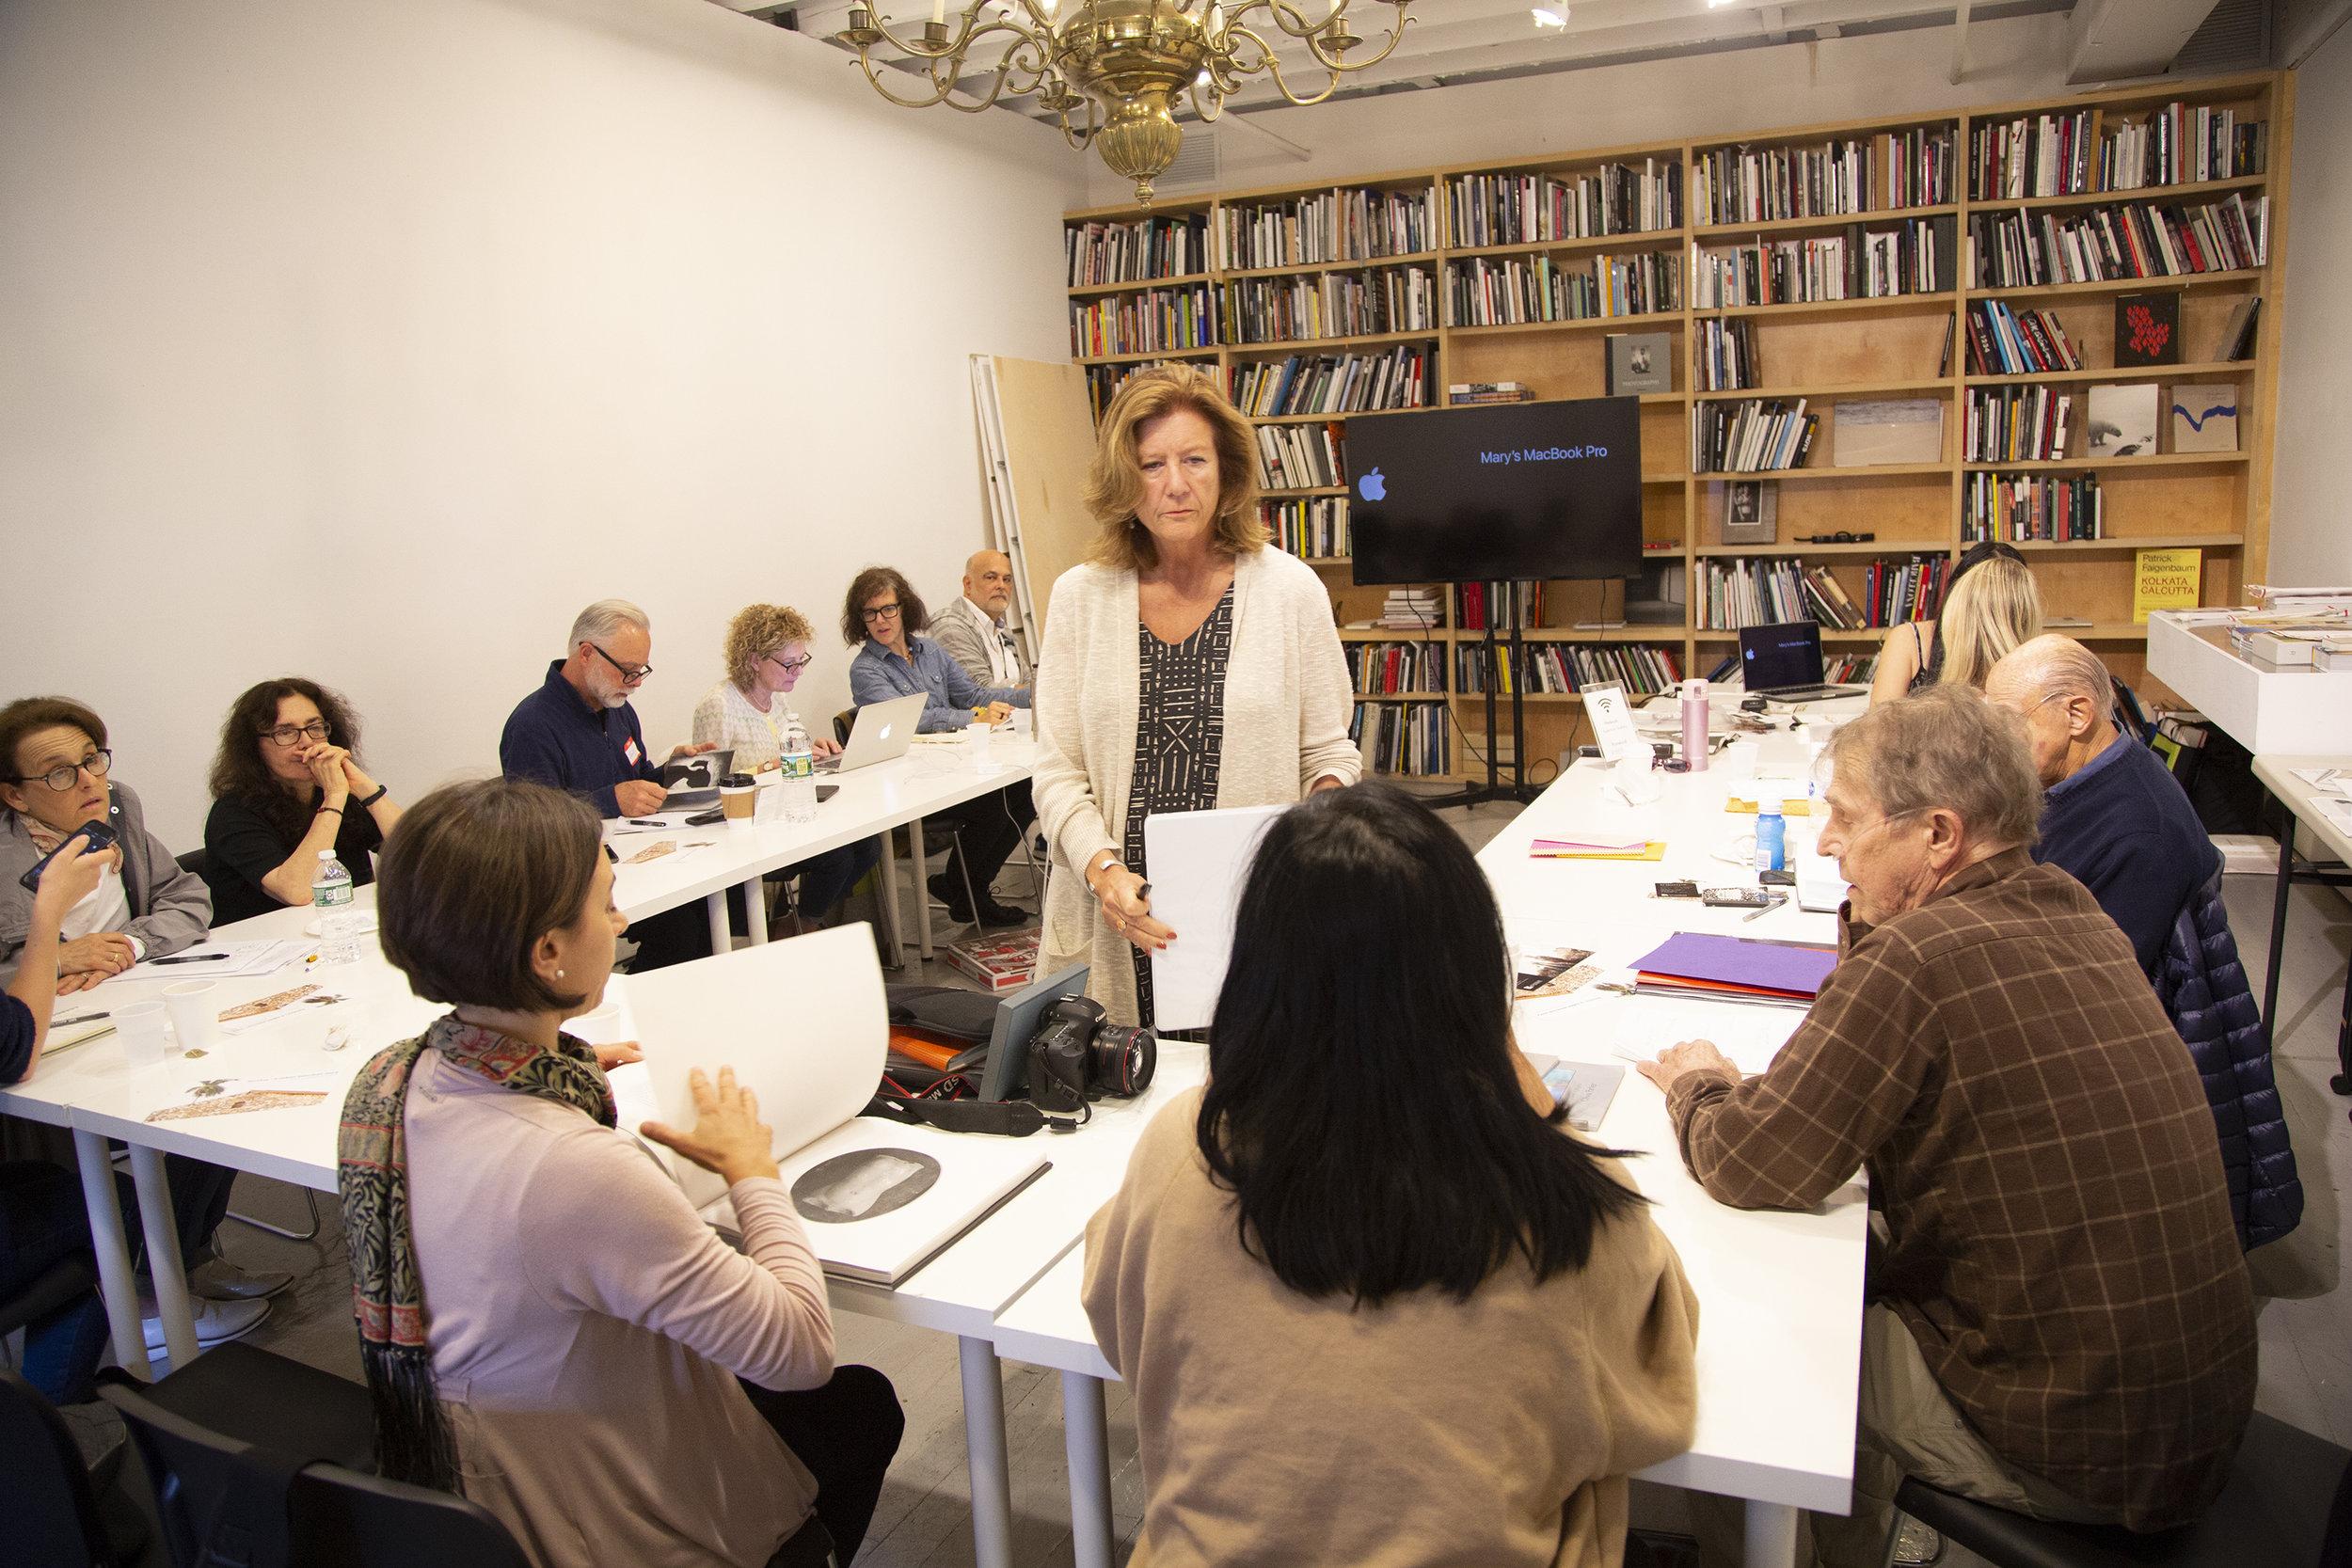 Workshop at Aperture